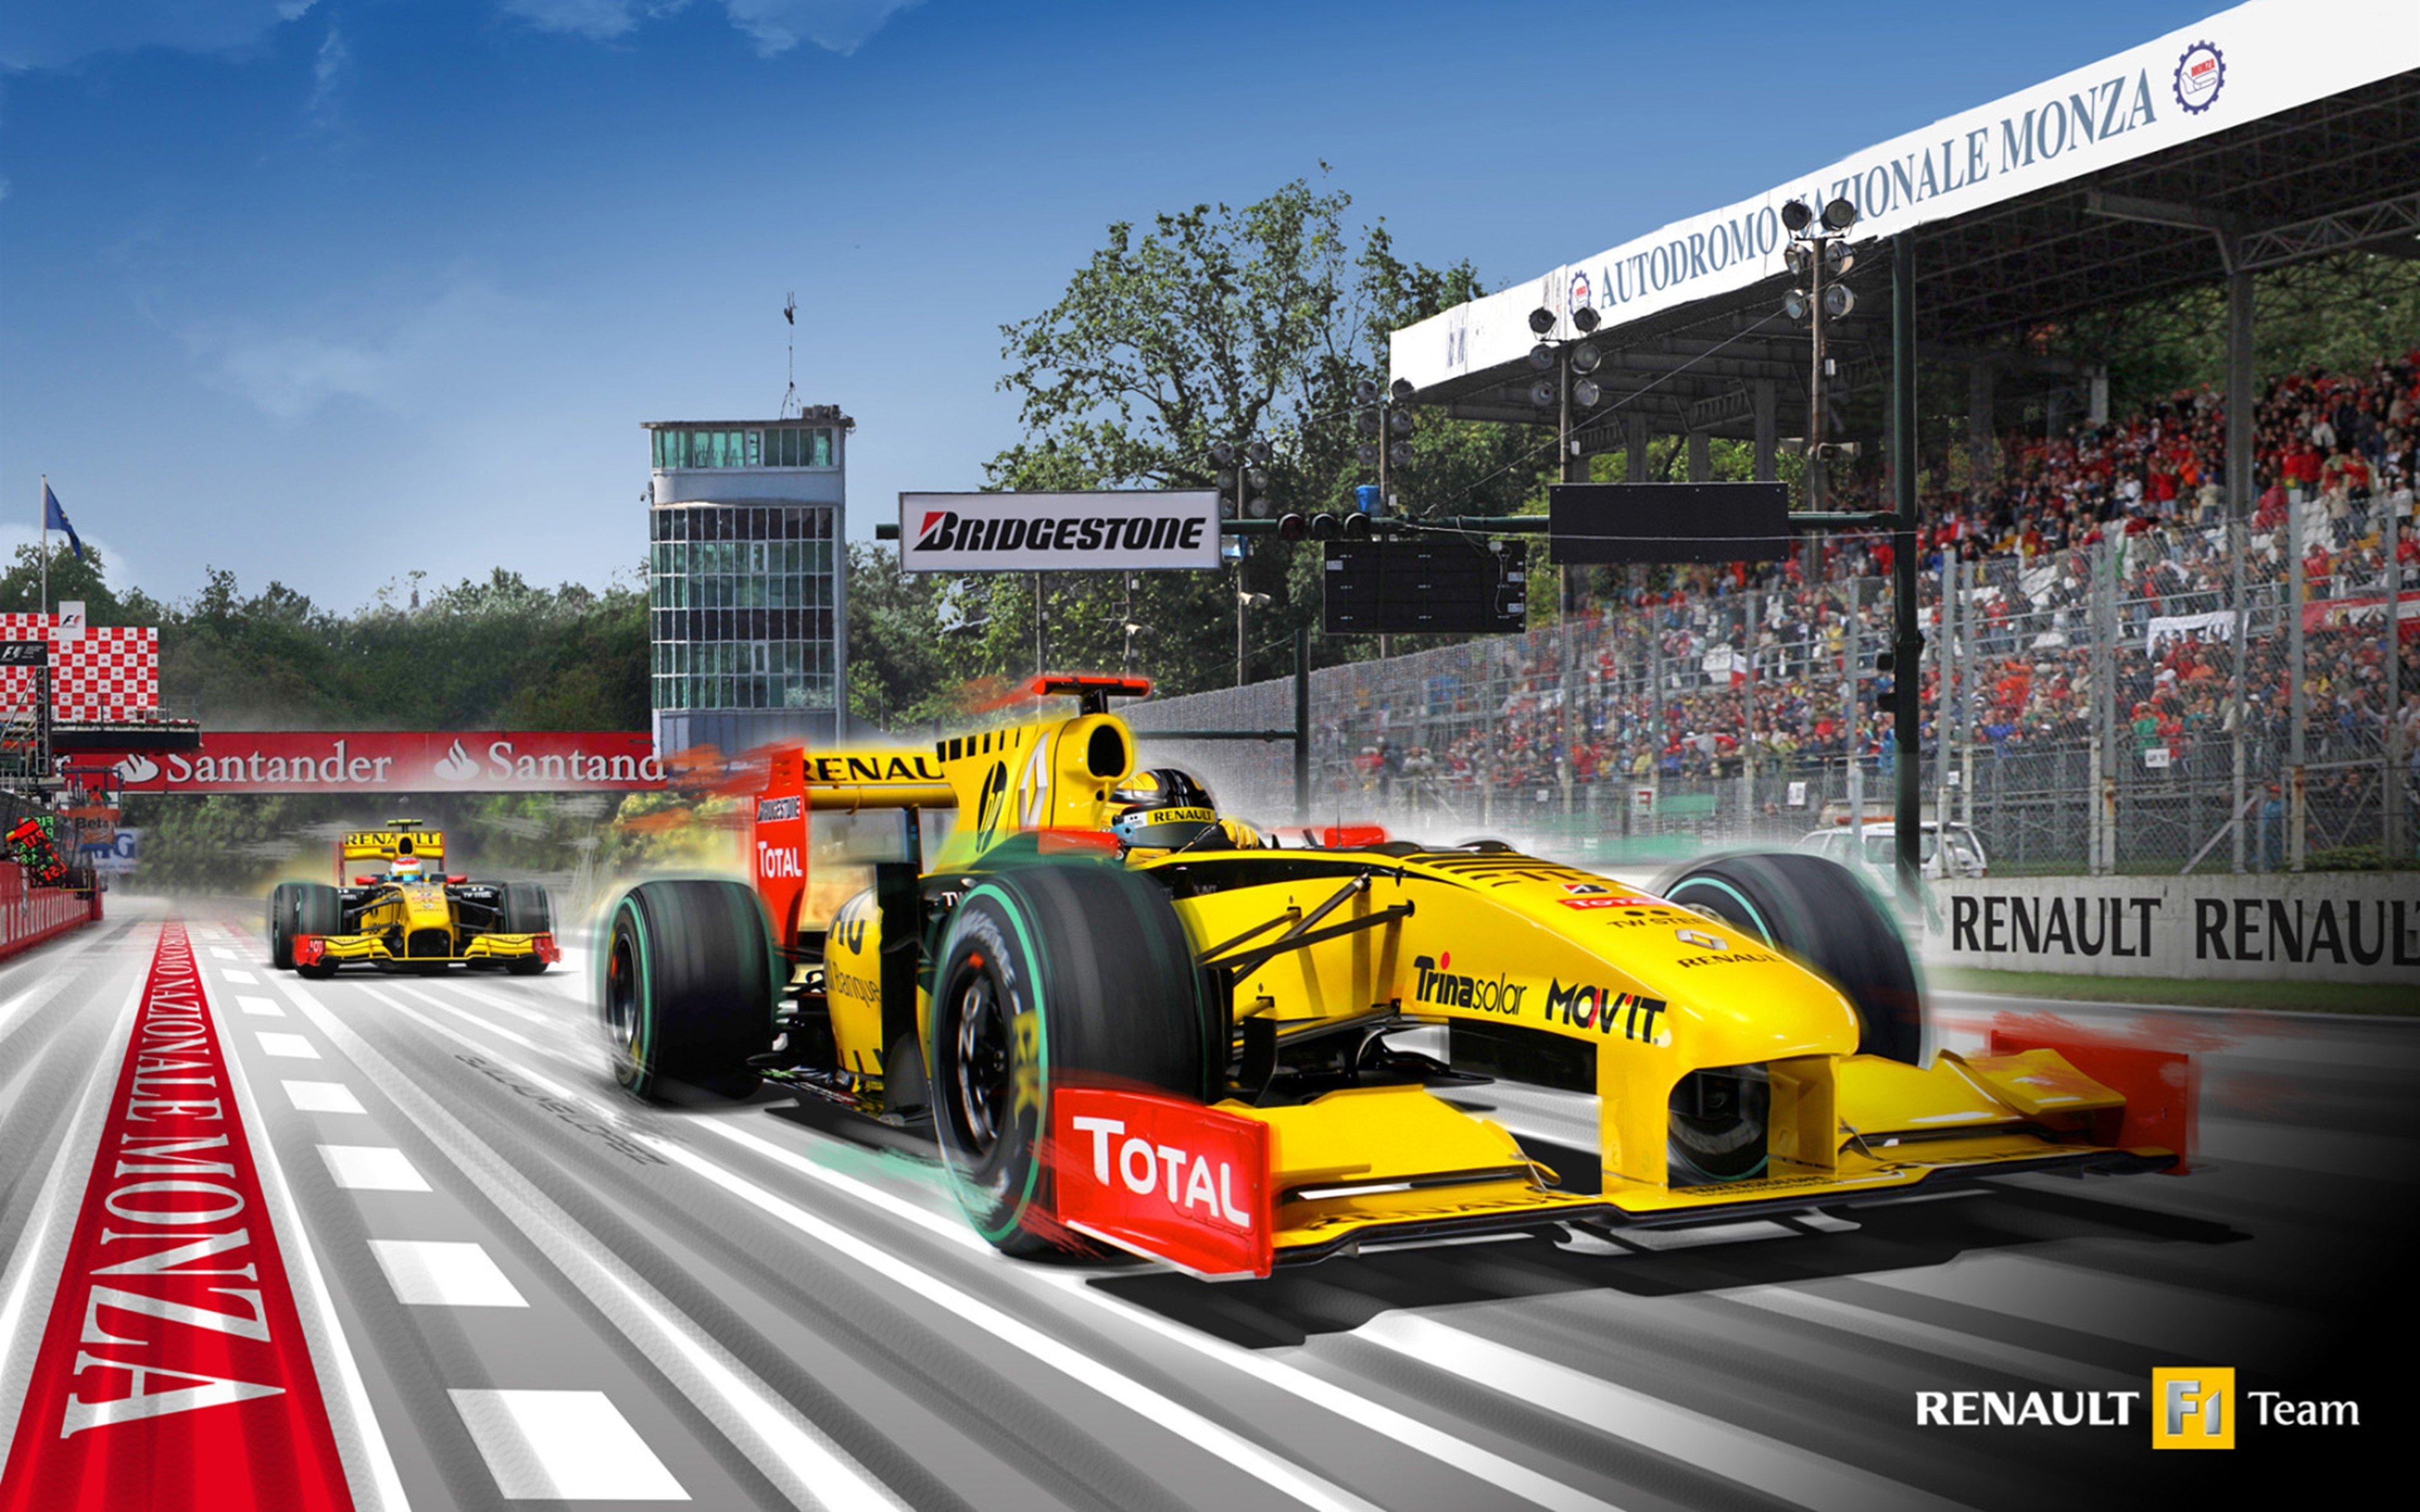 renault formula 1 wallpaper - photo #15